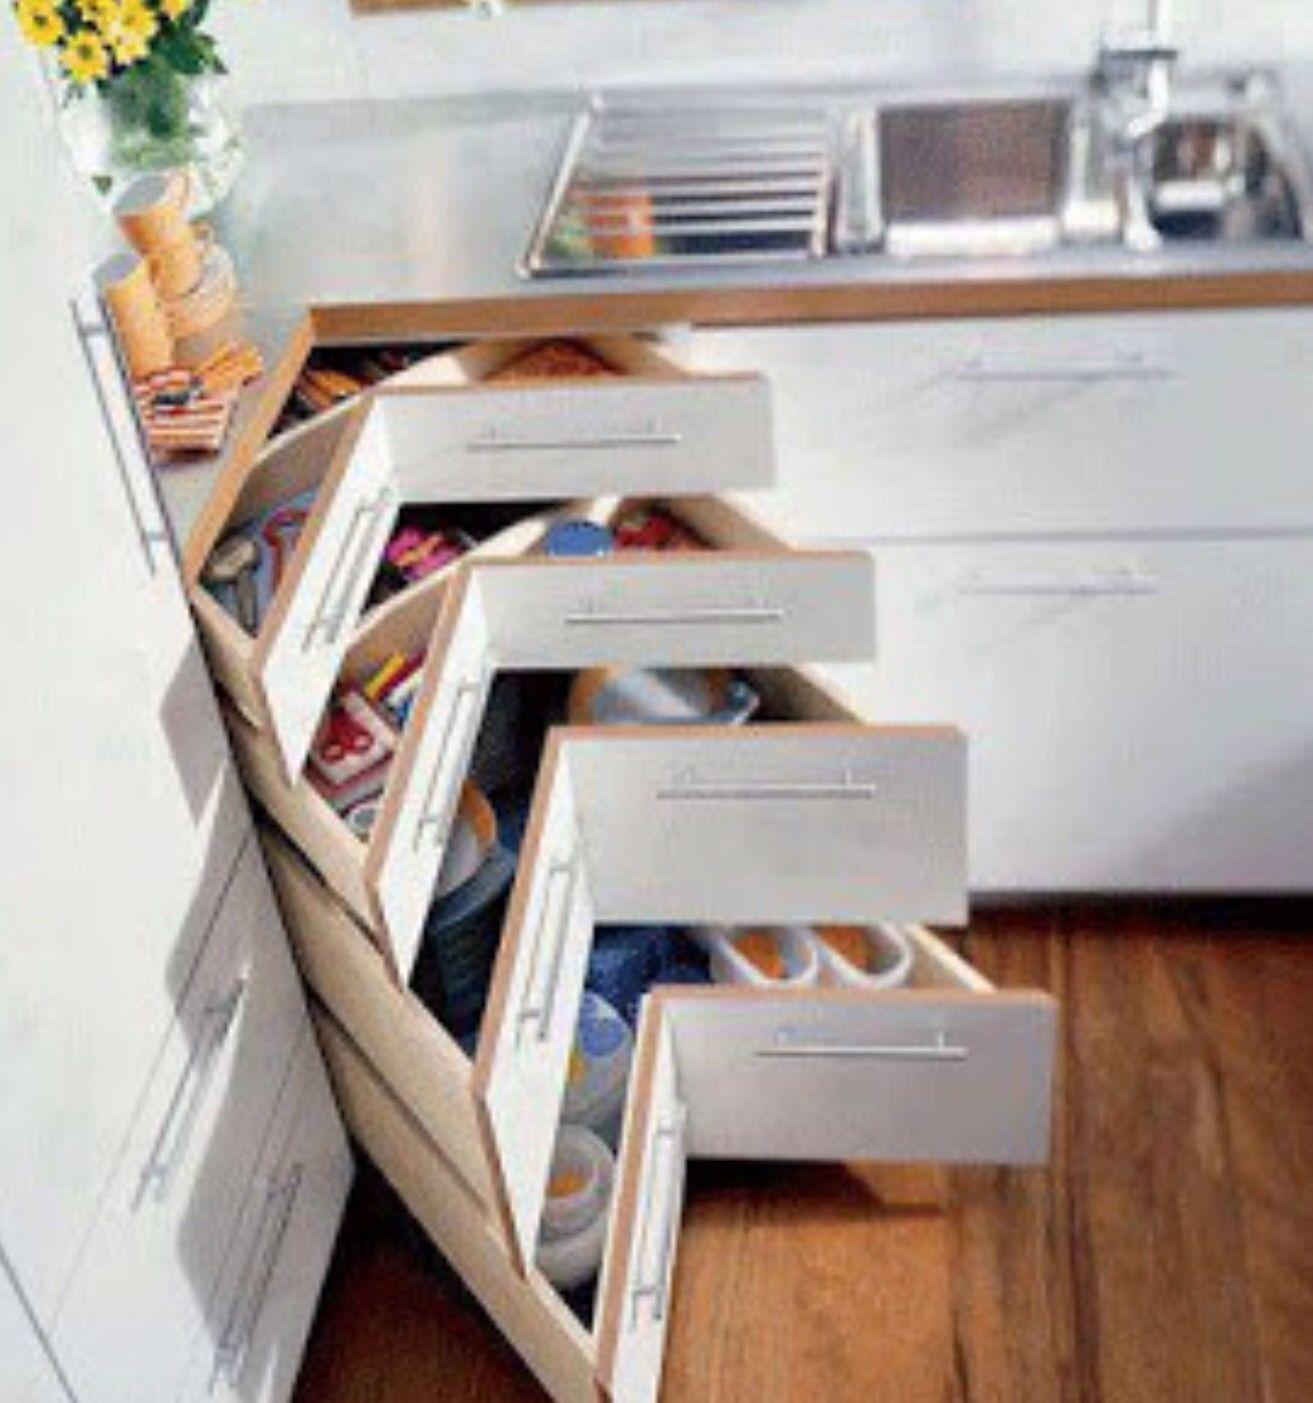 Corner drawers to save space | Space saving ideas | Pinterest ...